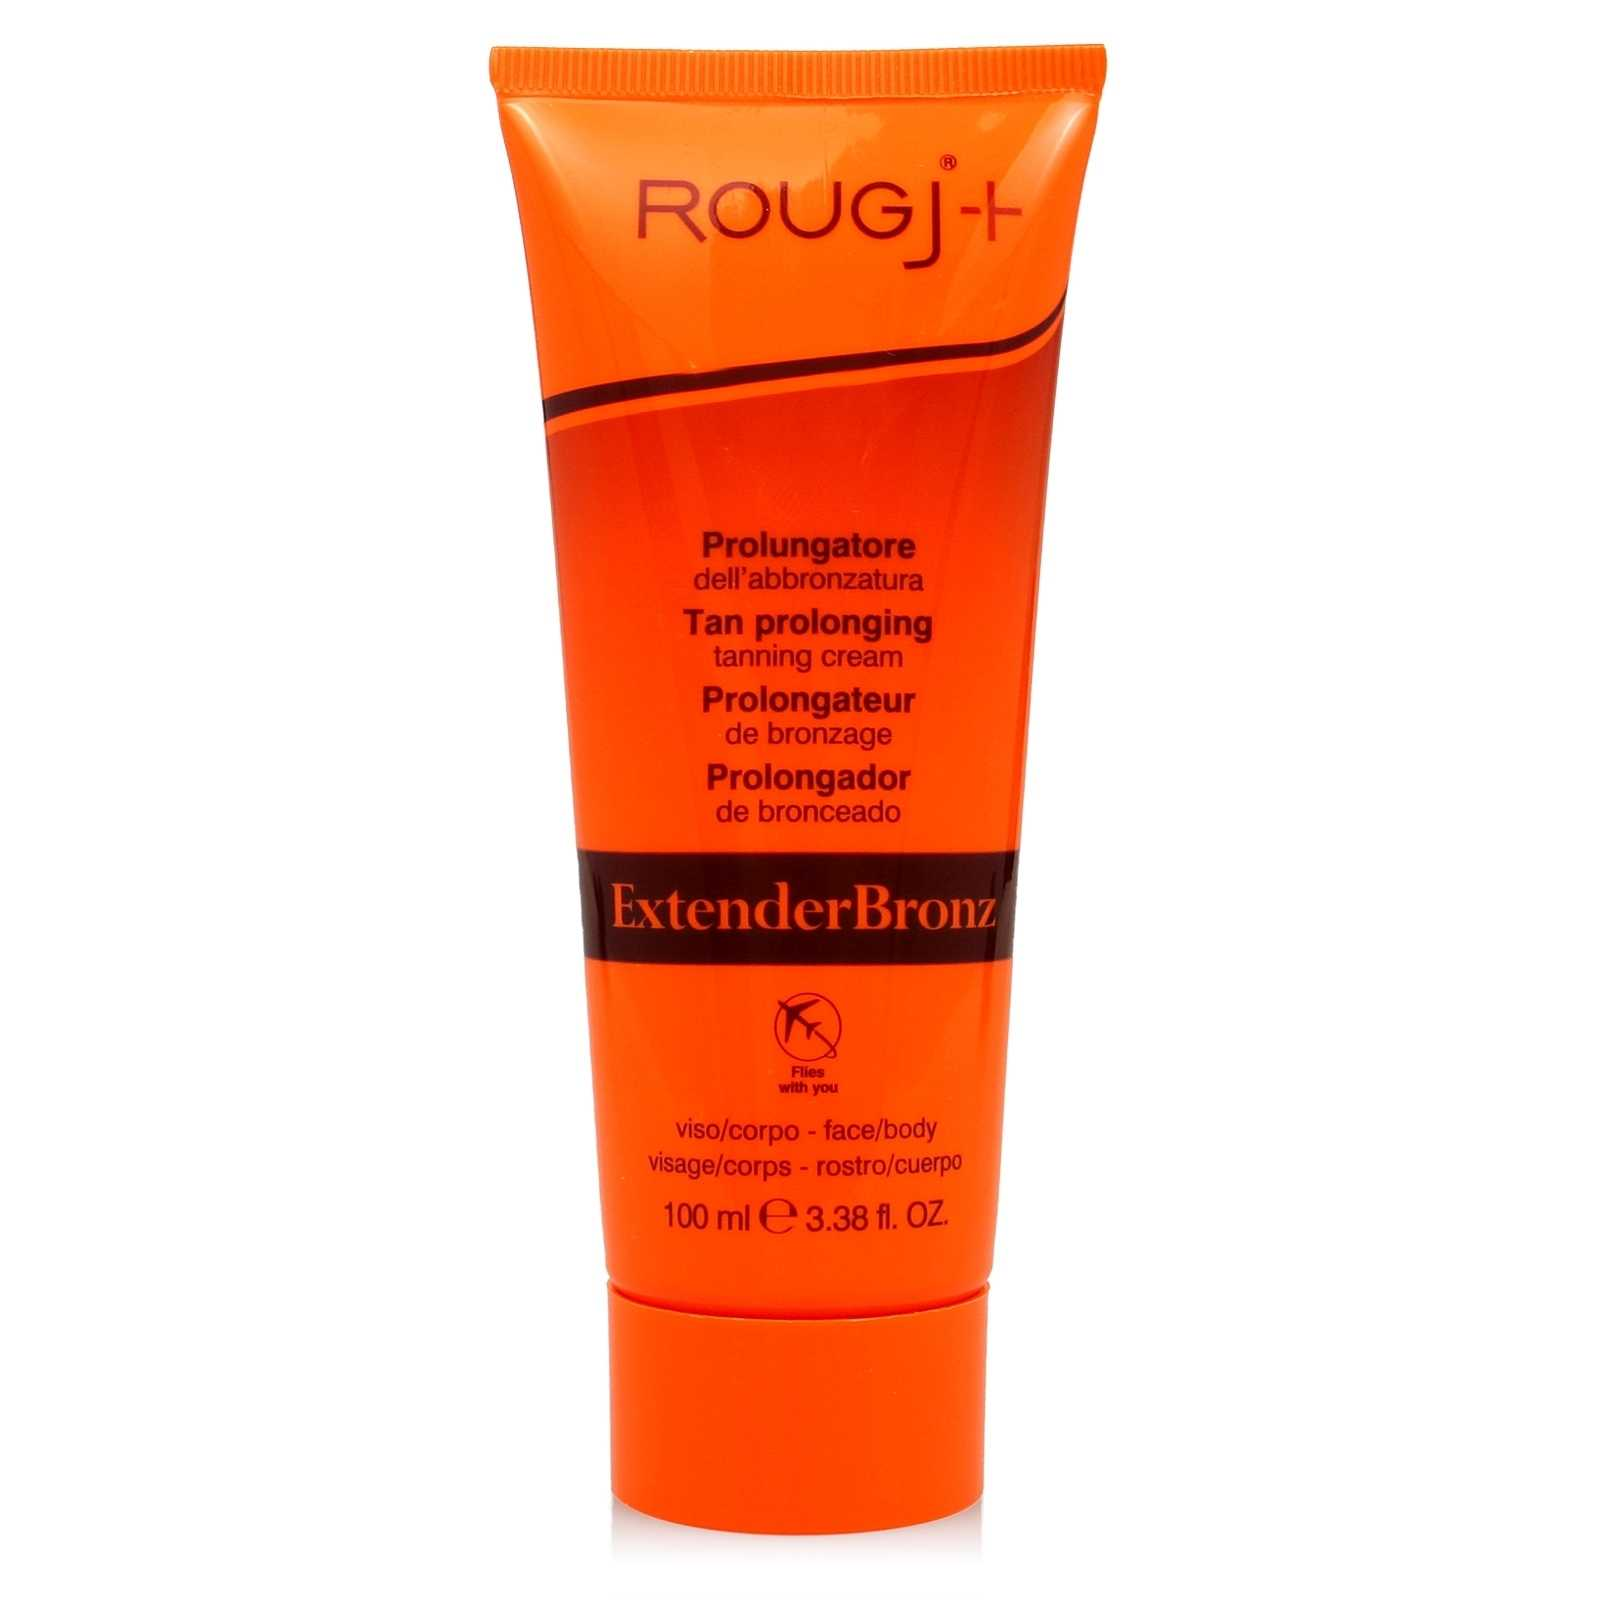 Rougj - ExtenderBronz - Prolungatore dell'abbronzatura